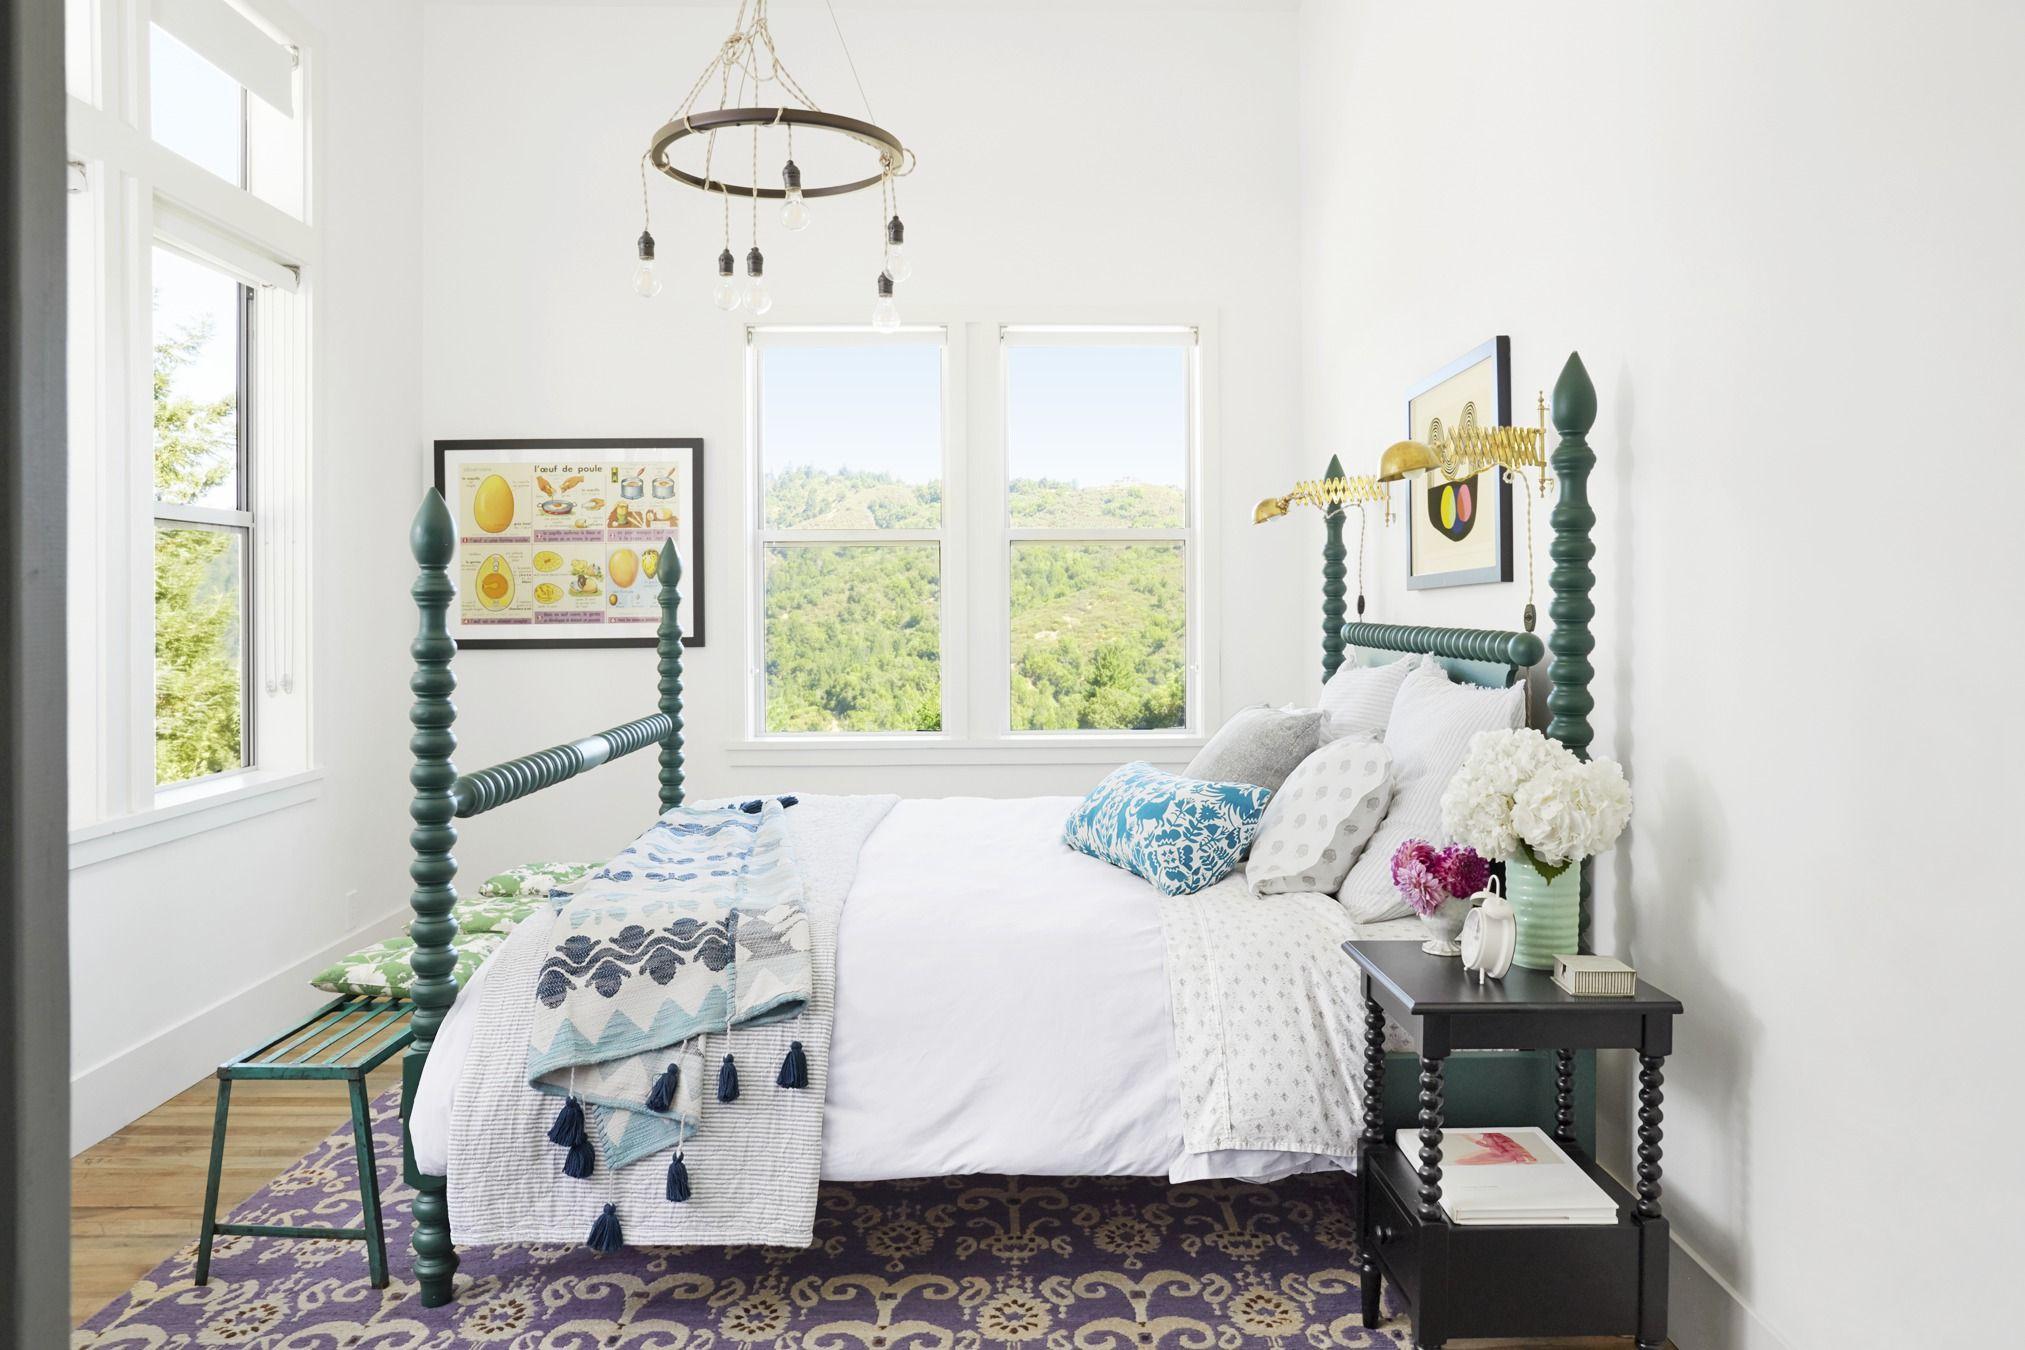 10+ Bedroom Decorating Ideas in 10 - Designs for Beautiful Bedrooms